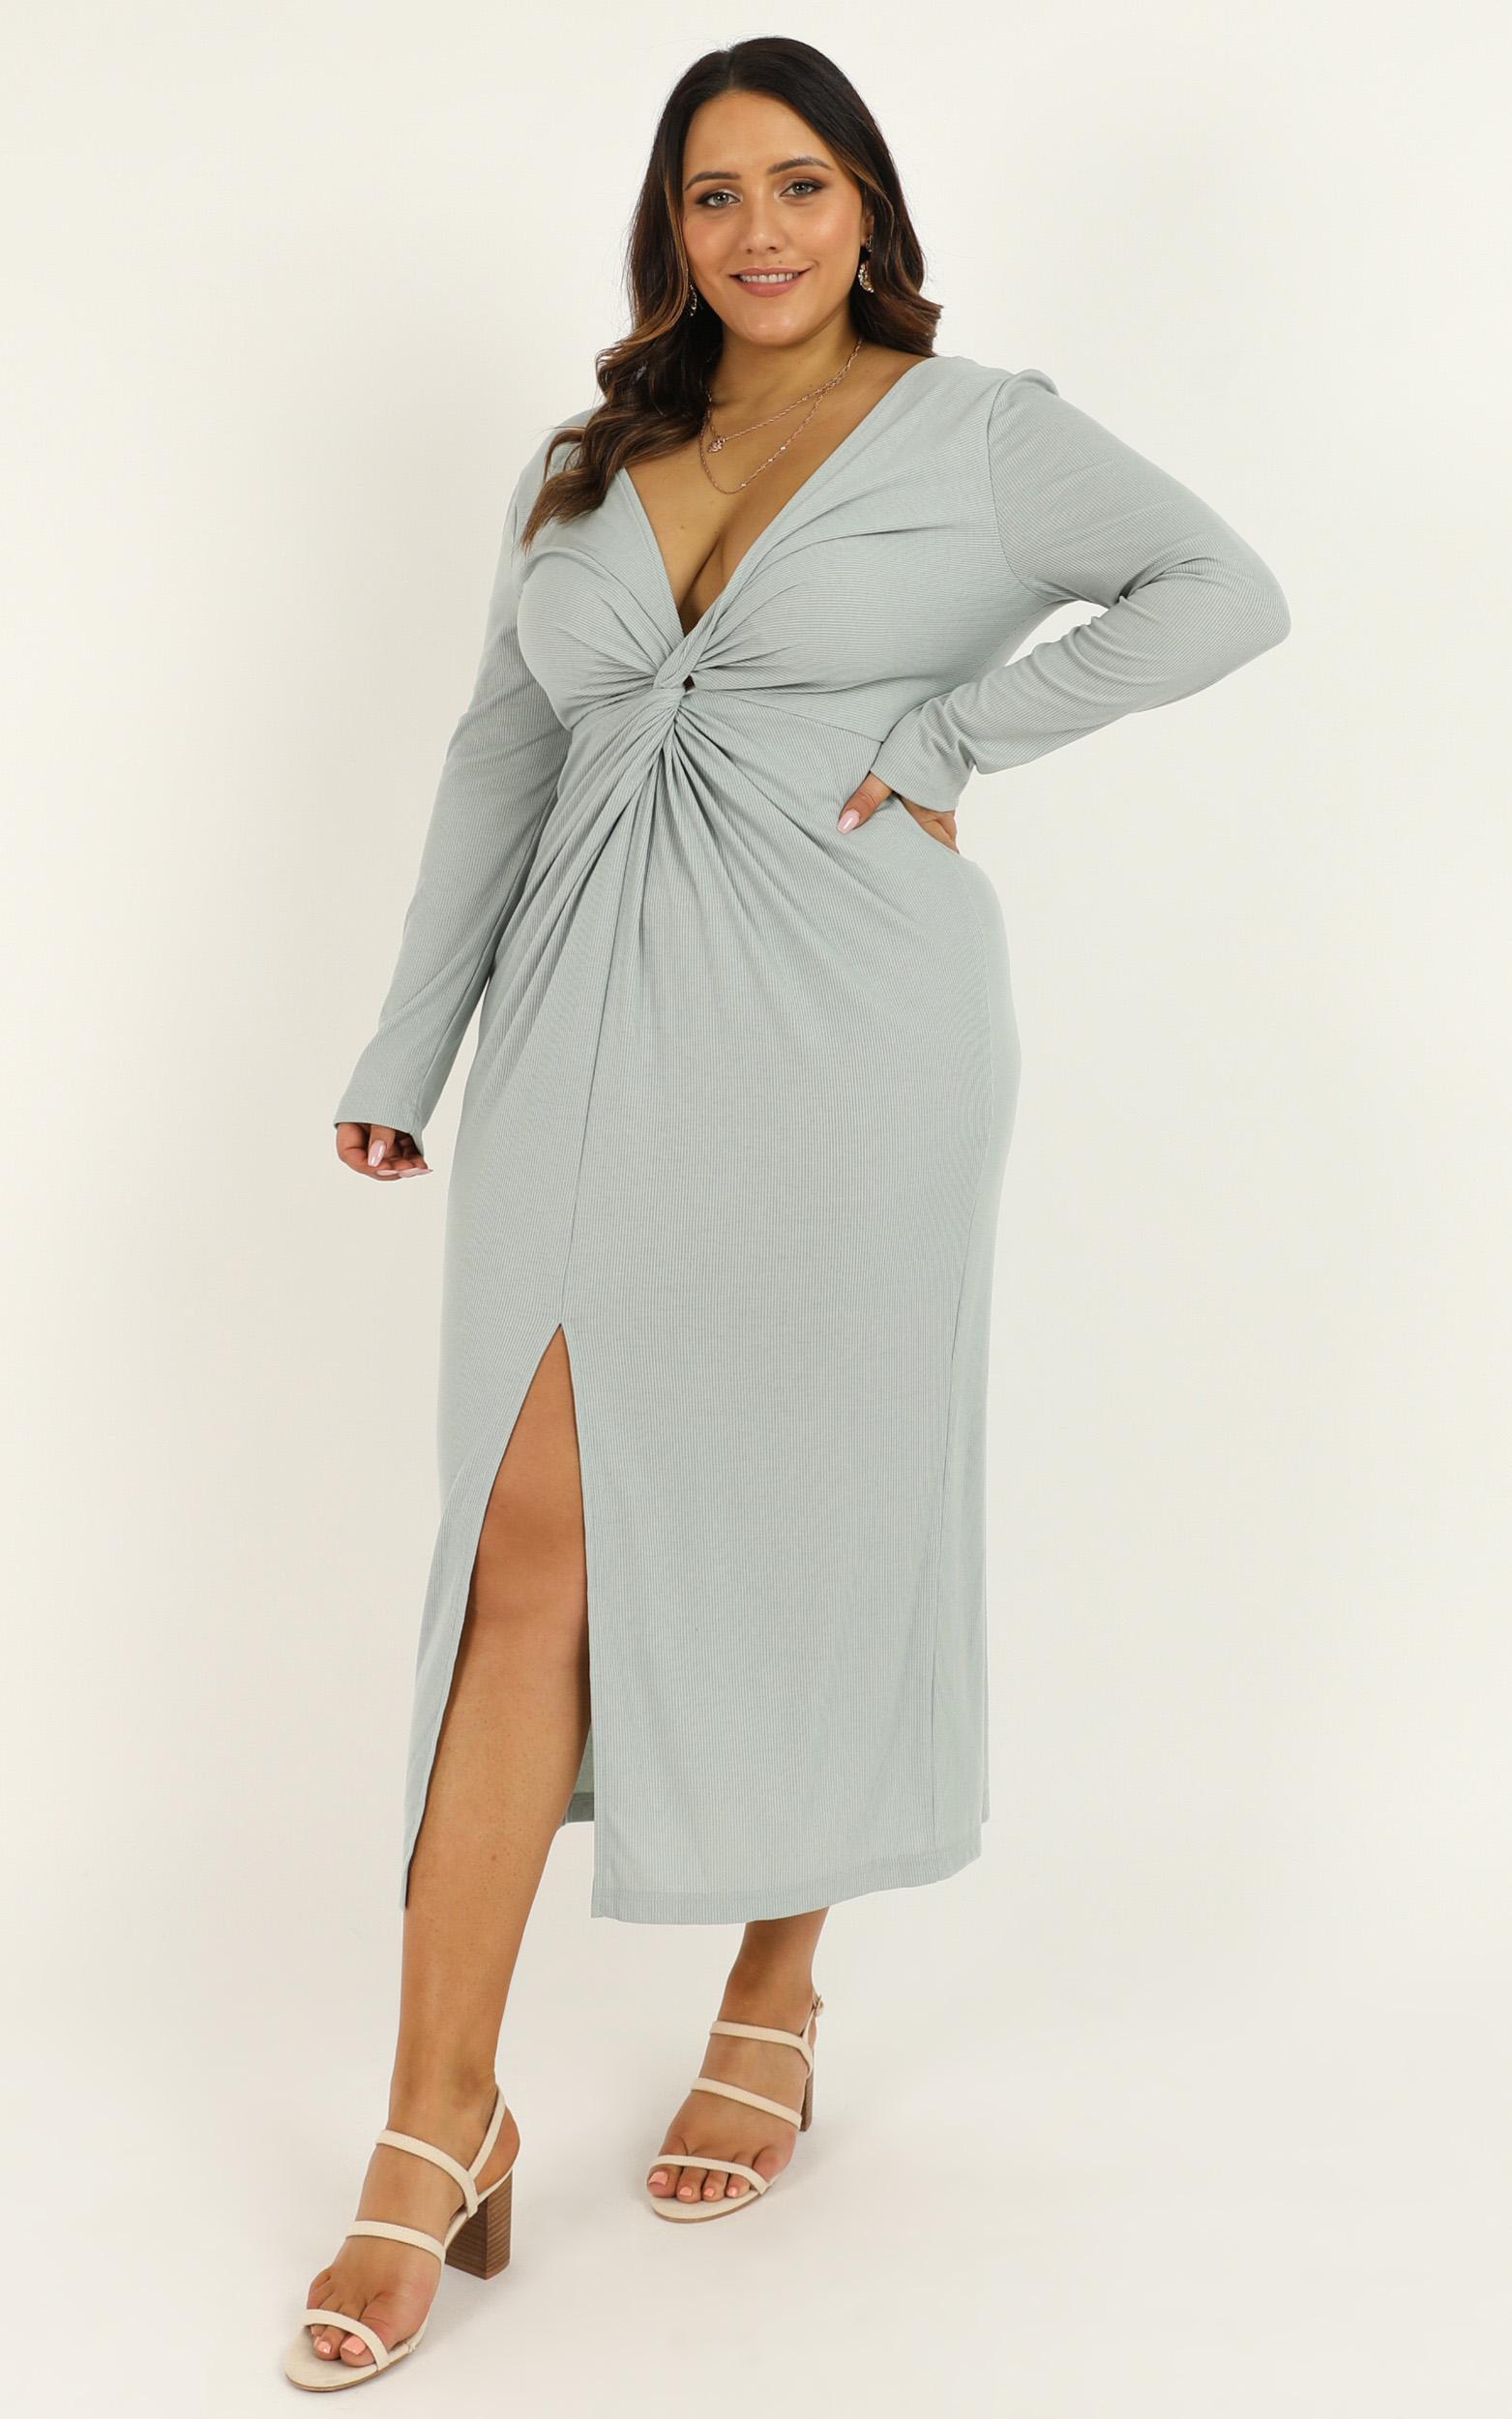 Prime Dress in sage rib - 10 (M), Sage, hi-res image number null